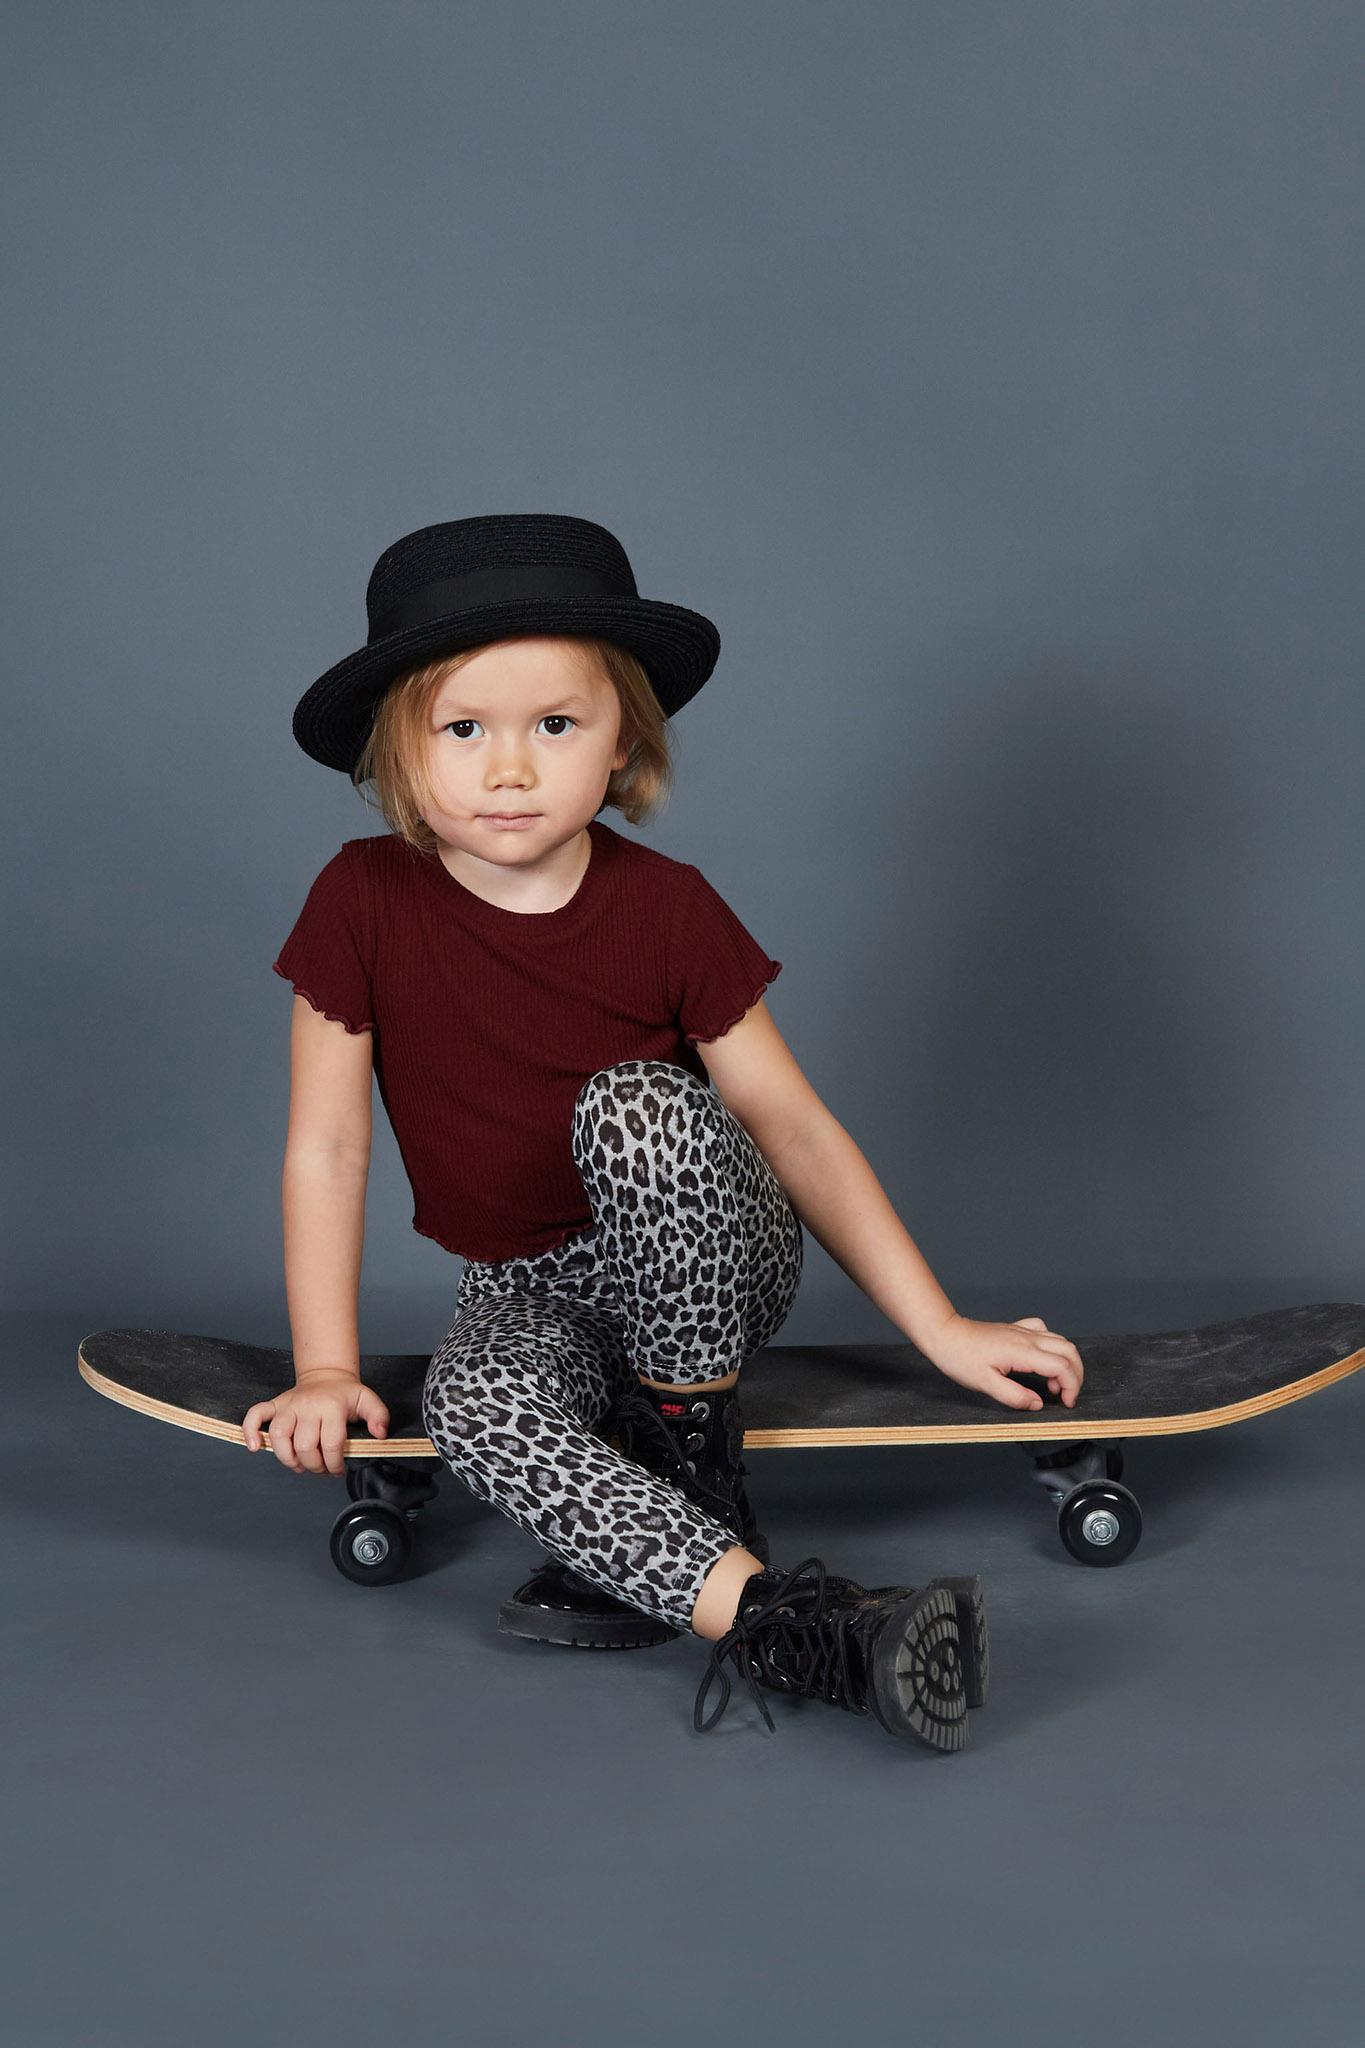 kids-catalog-photography-the-jersey-shop-9